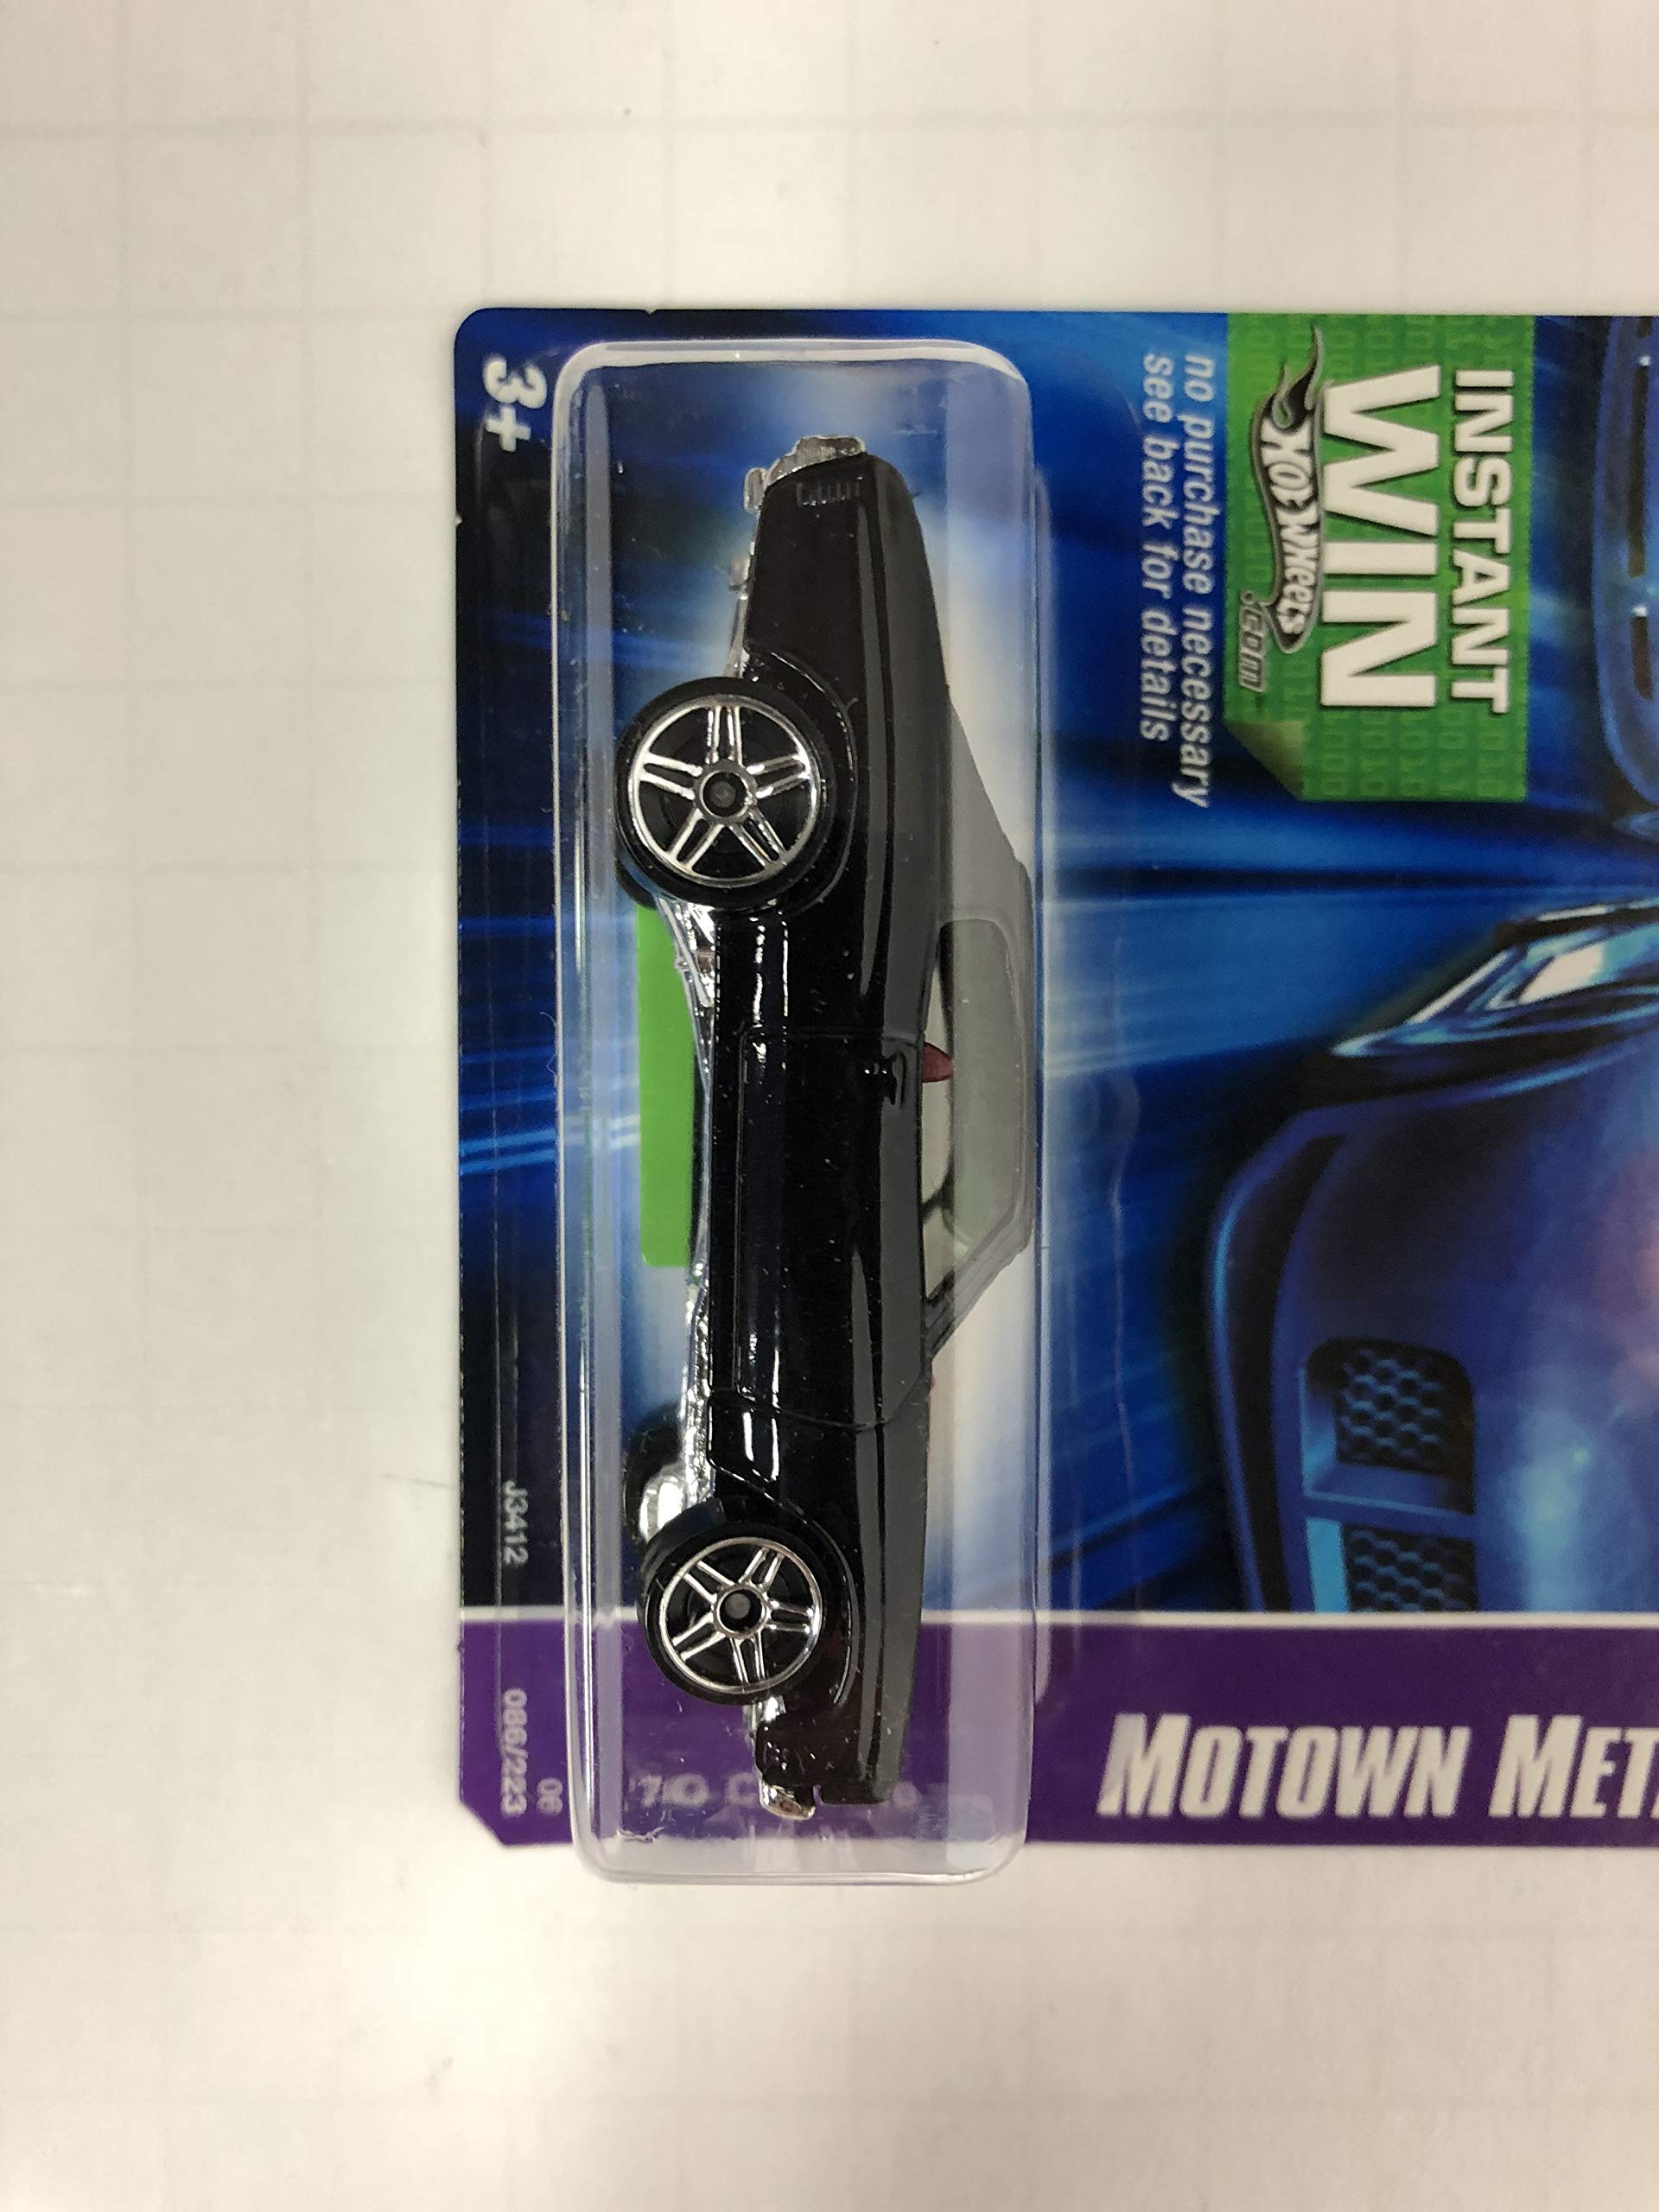 '70 Chevelle Motown Metal No. 086 Hot Wheels 2006 1/64 scale diecast car